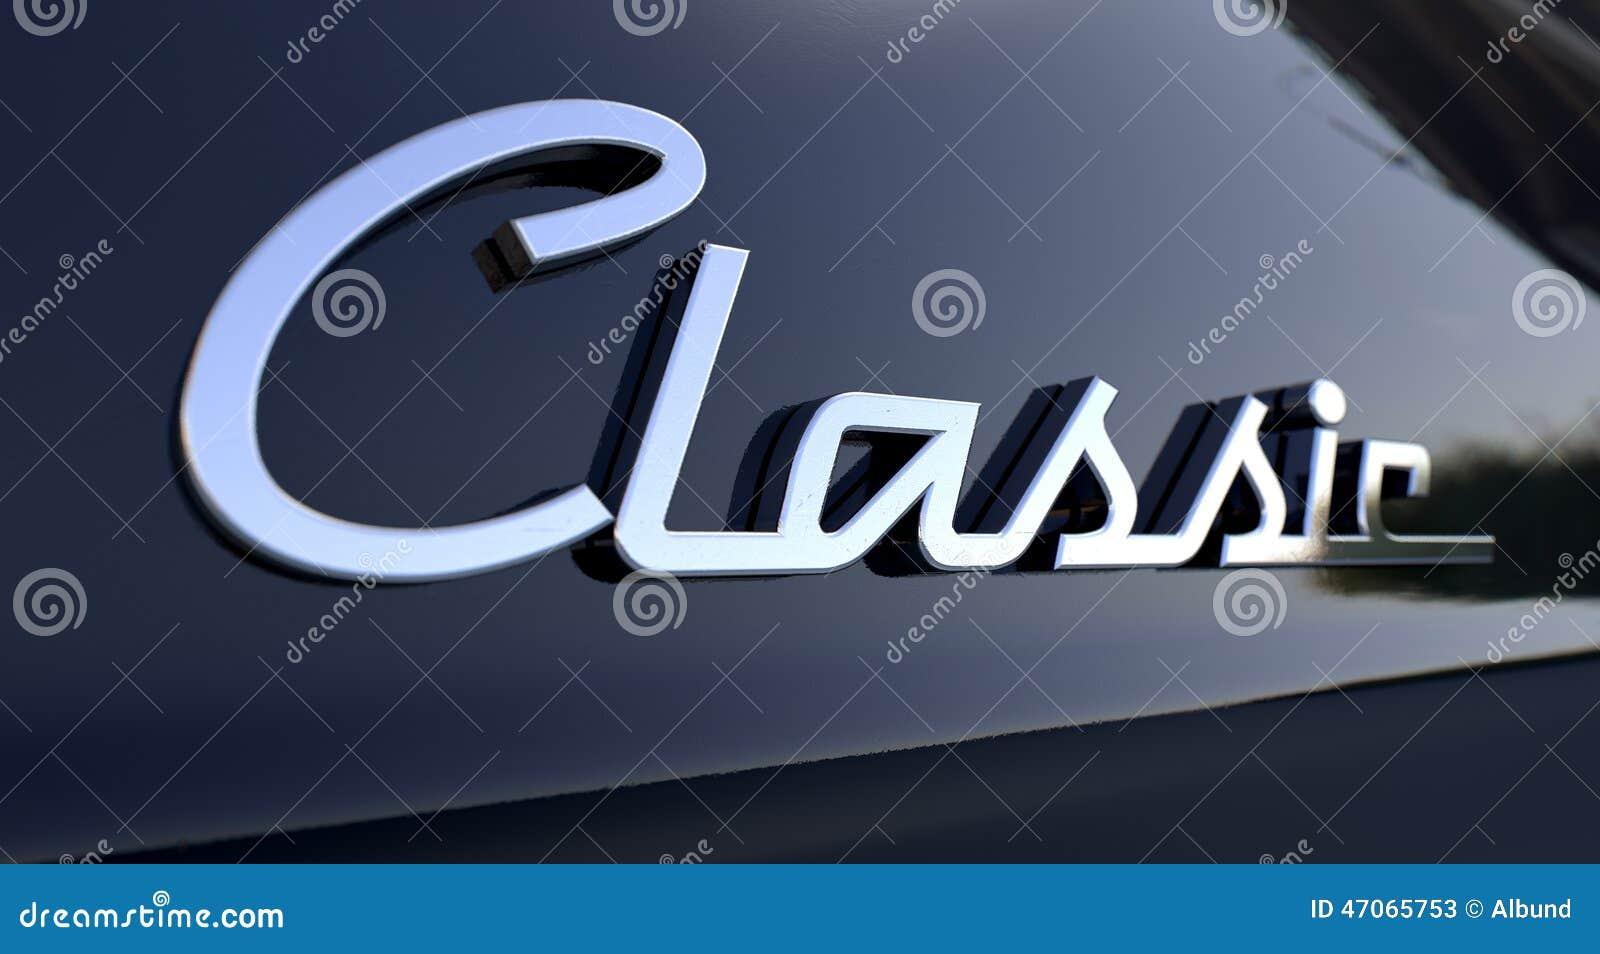 Classic Chrome Car Emblem